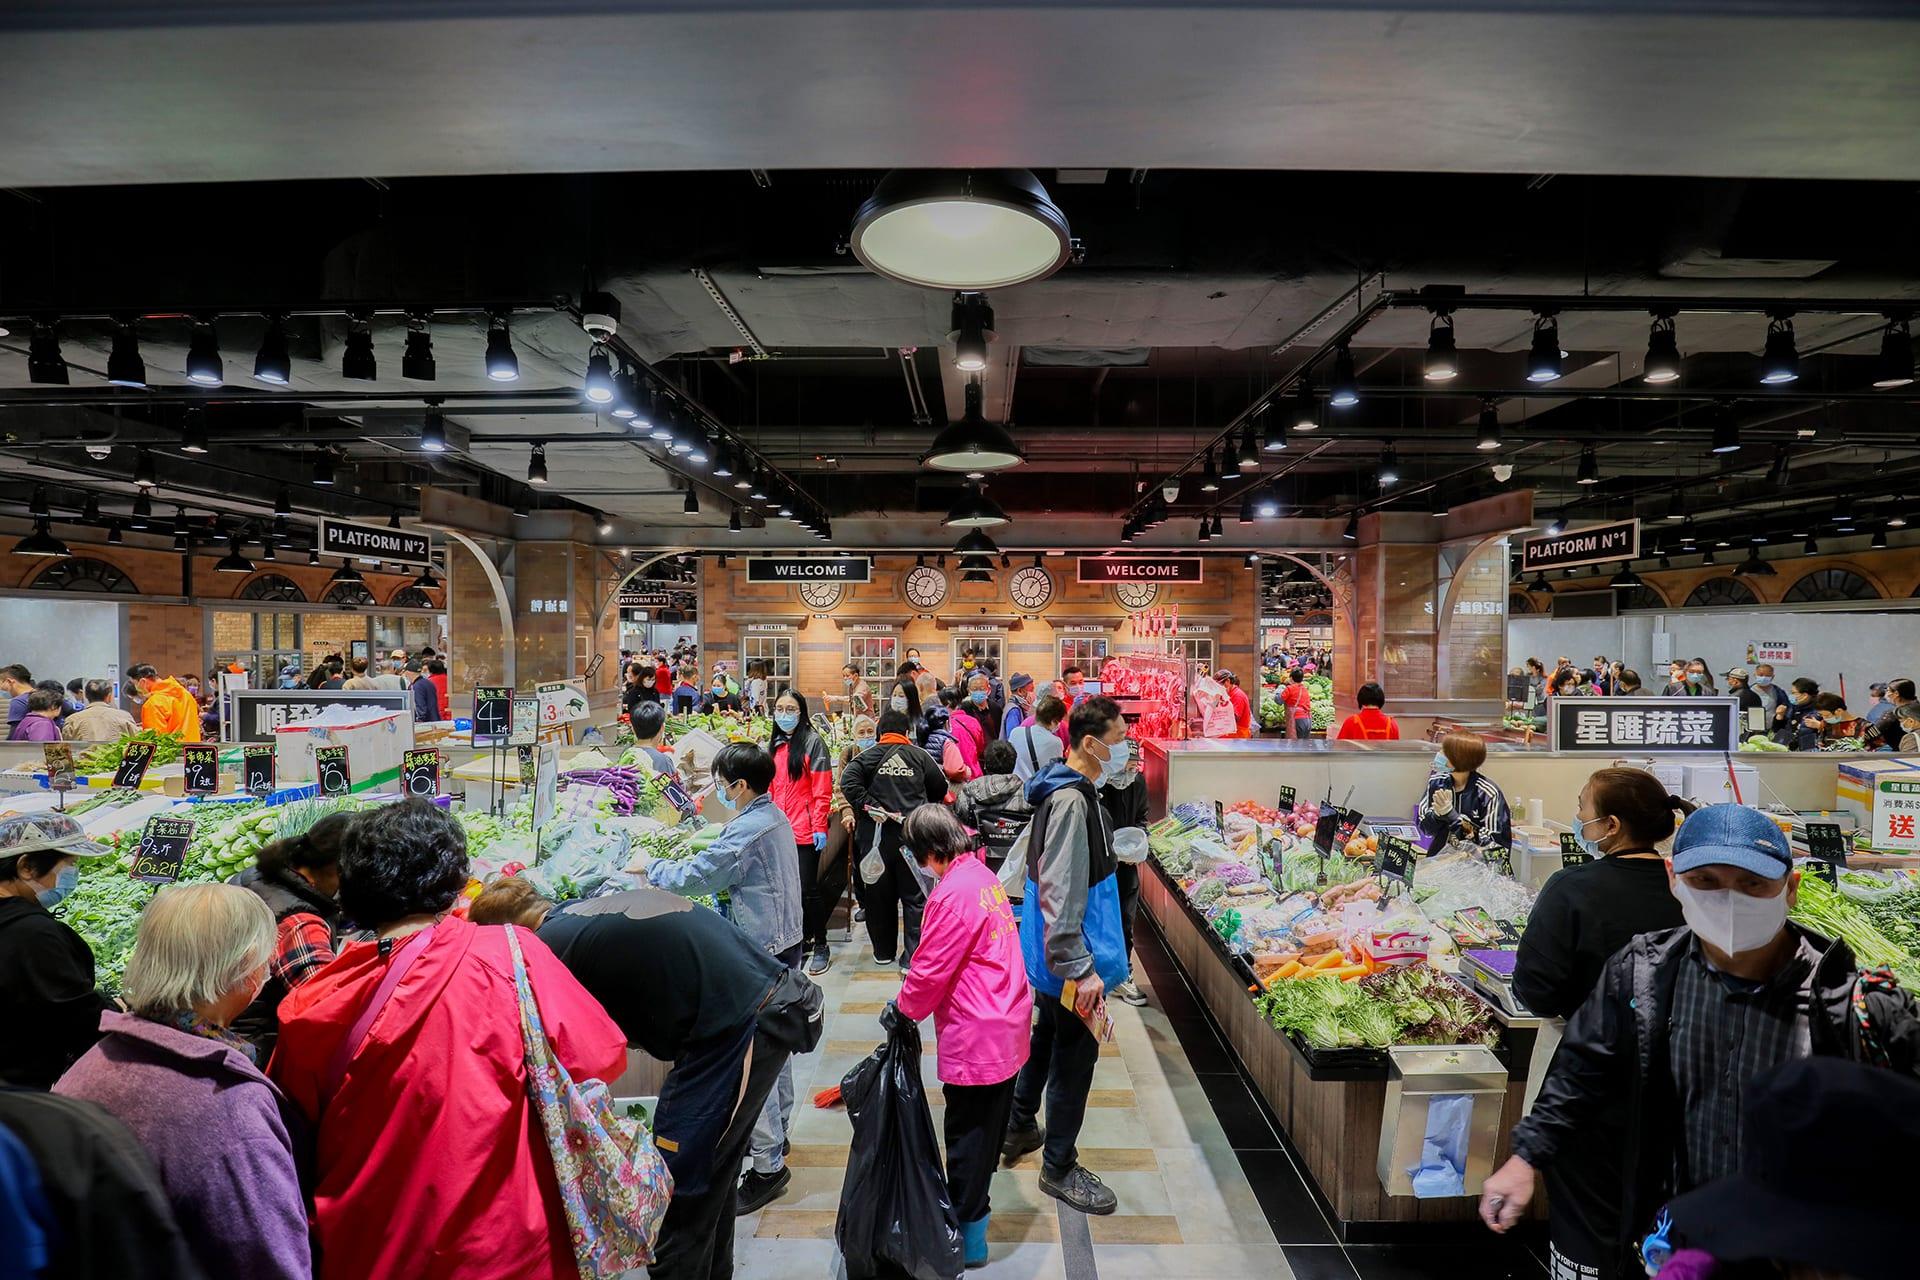 After-wet market interior